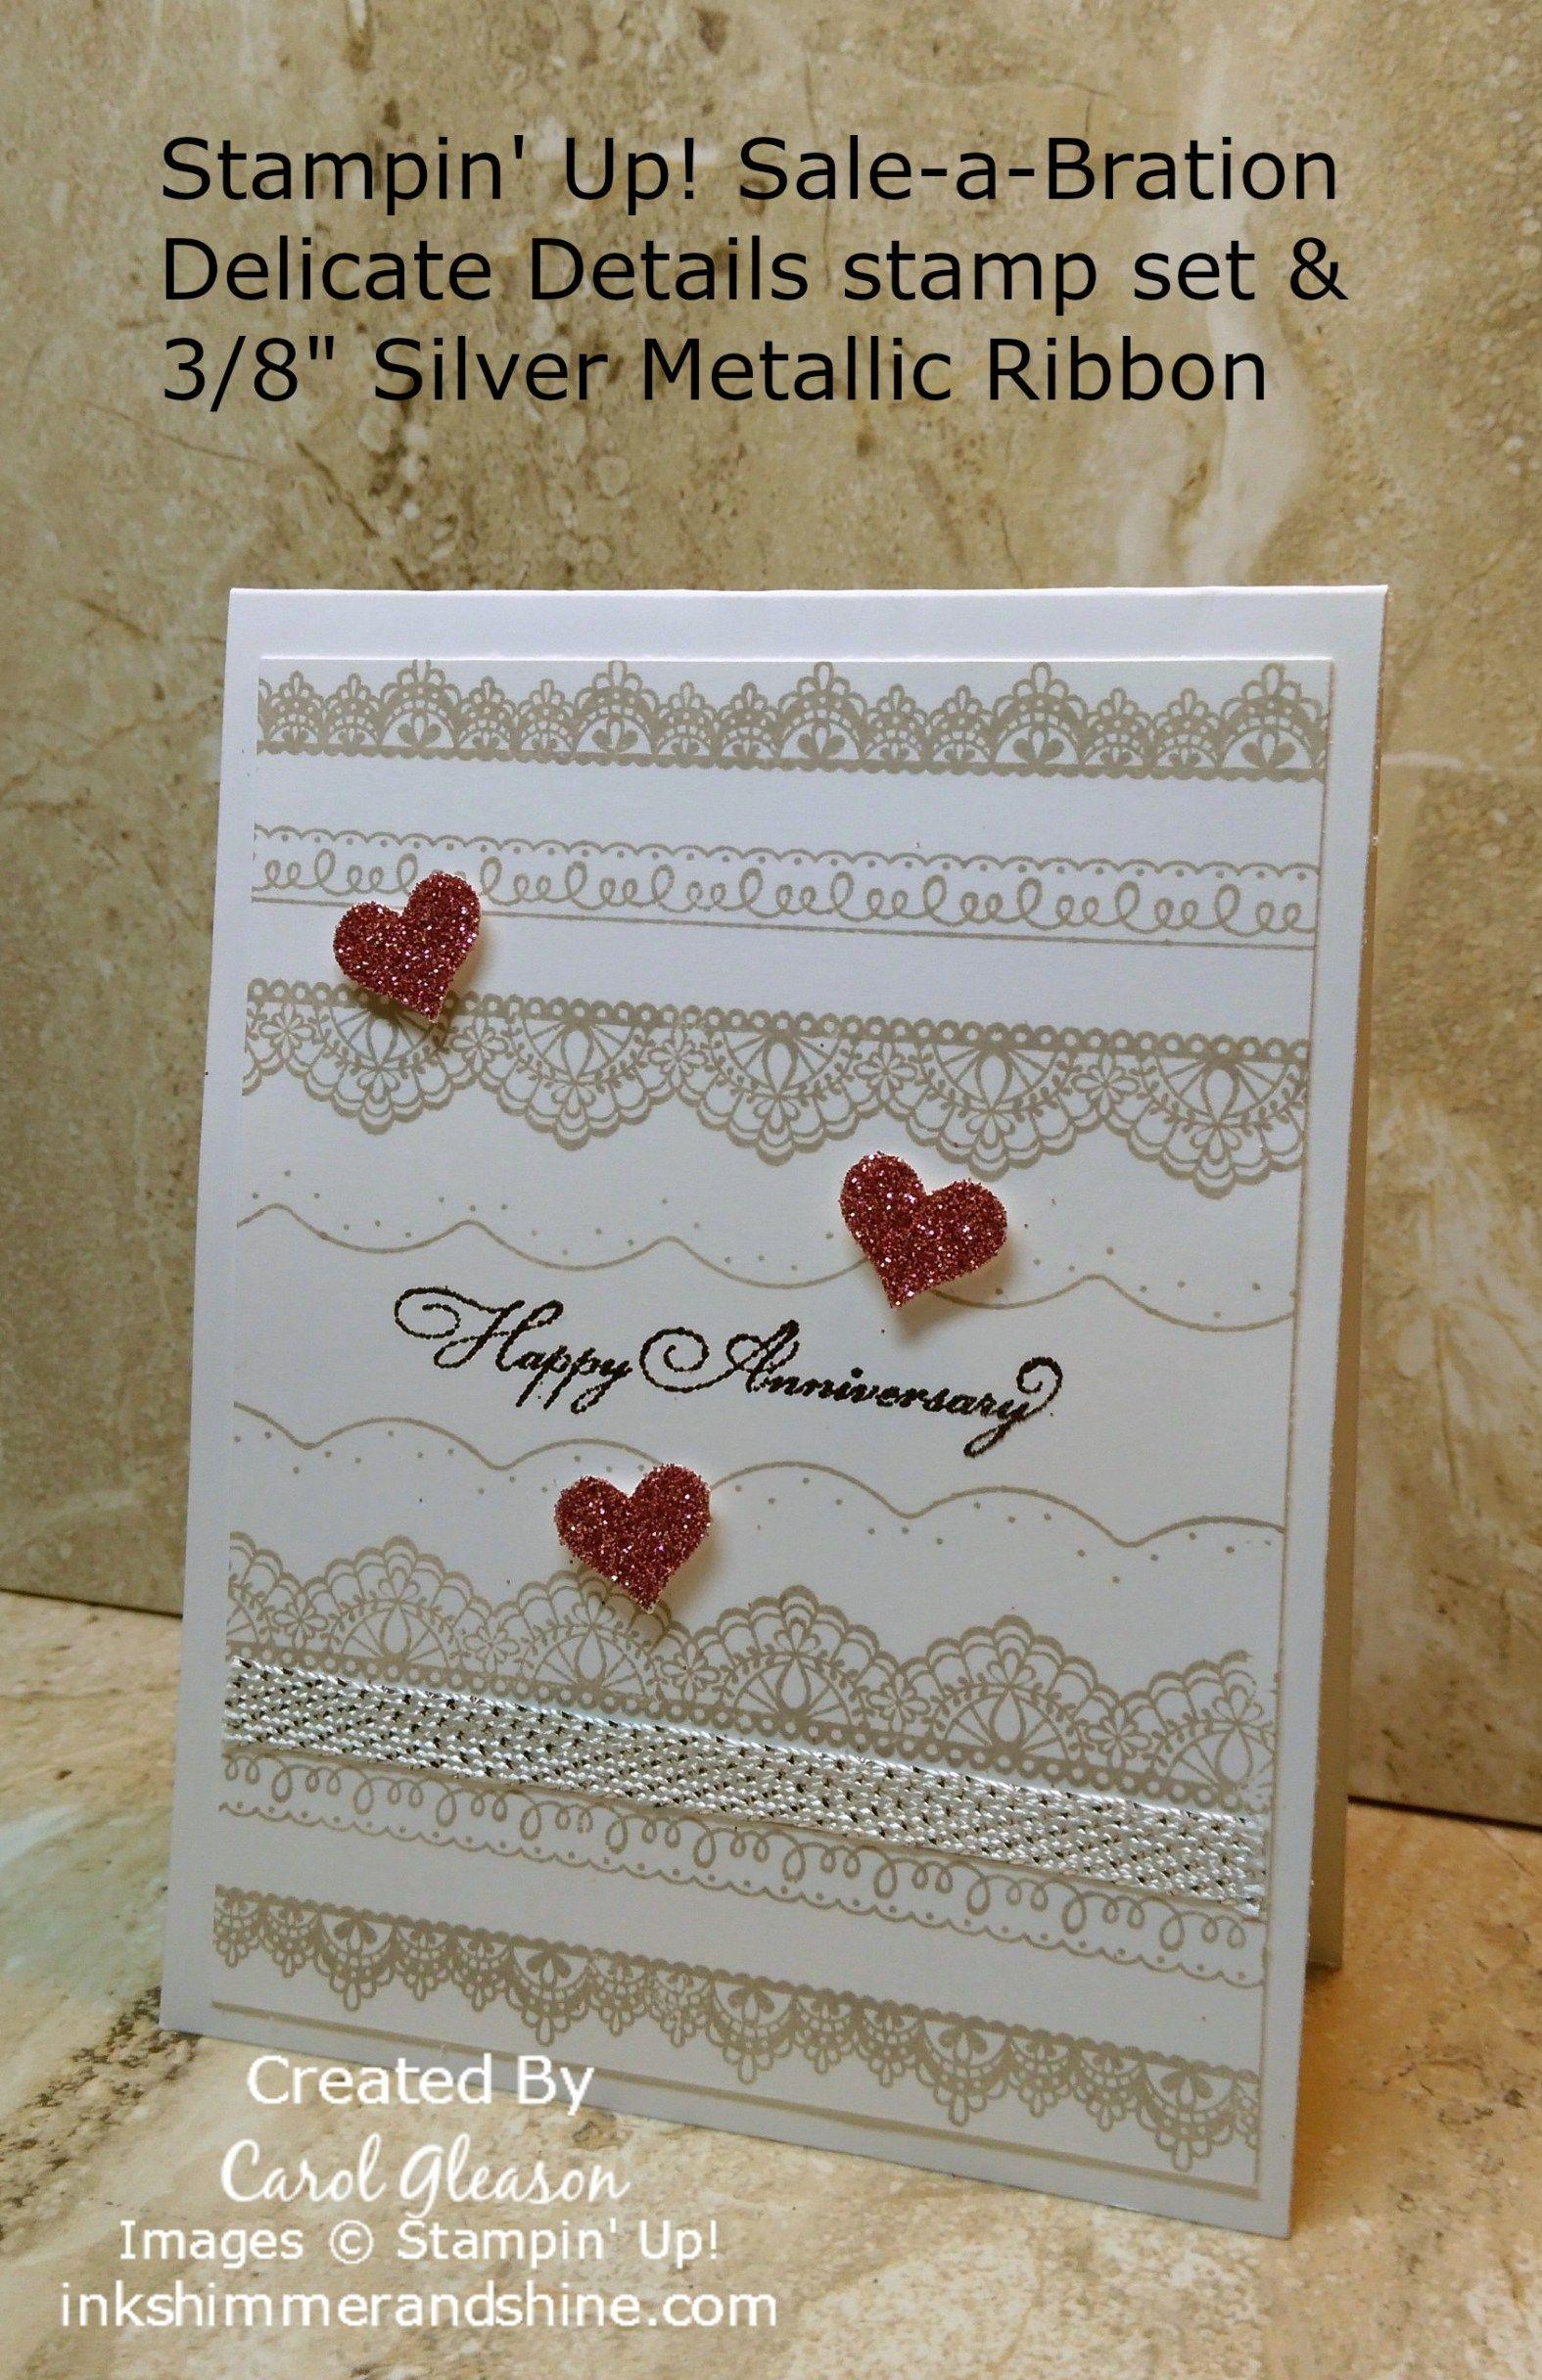 Beautiful Lace Anniversary Cards Handmade Anniversary Cards For Couple Wedding Anniversary Cards